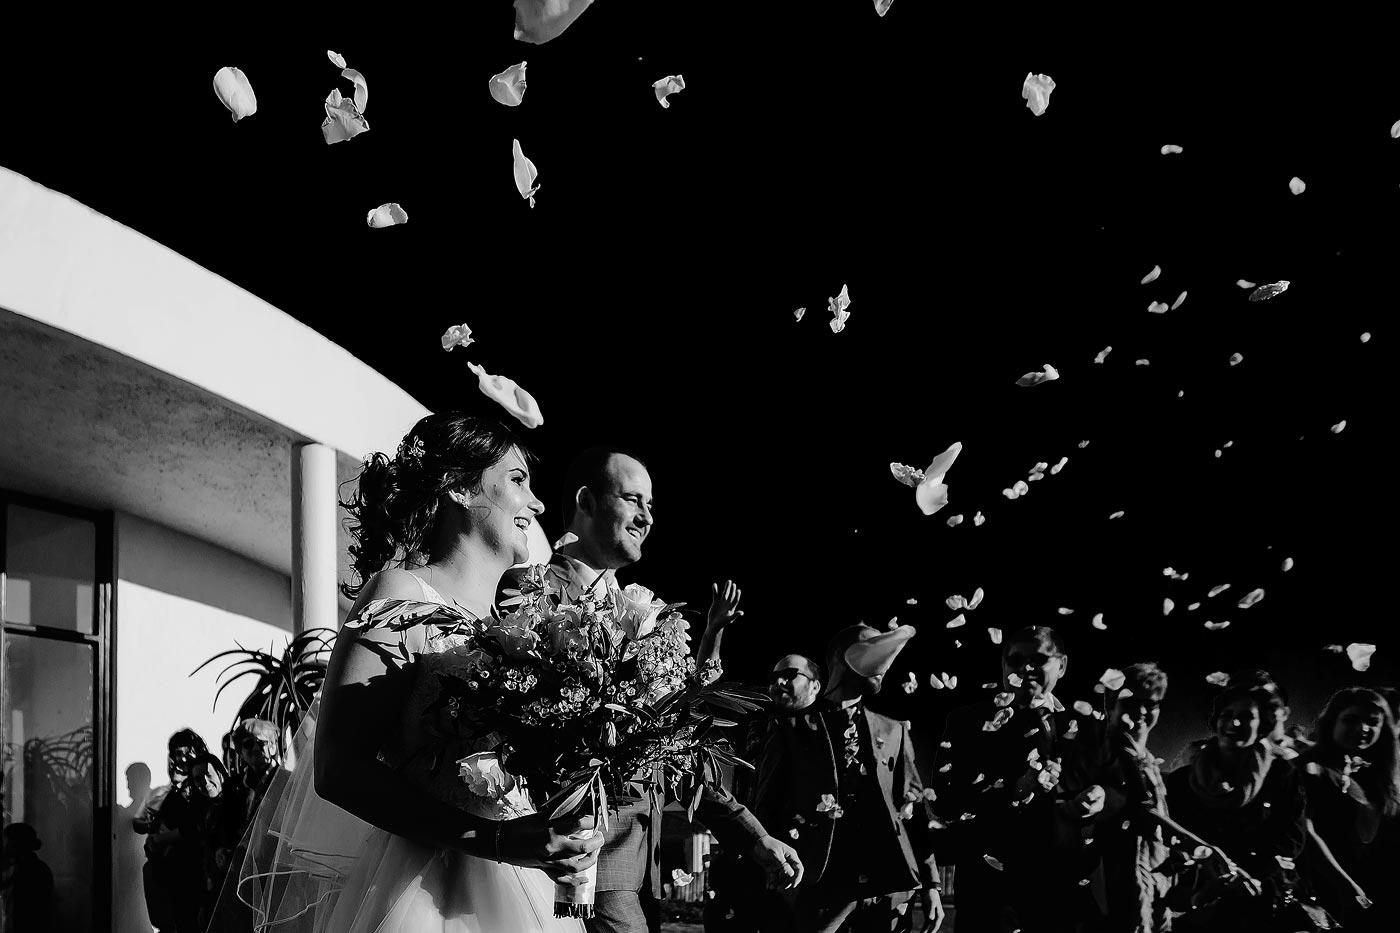 Copy of Creative Confetti Photo with Rose Petals at the beach venue.